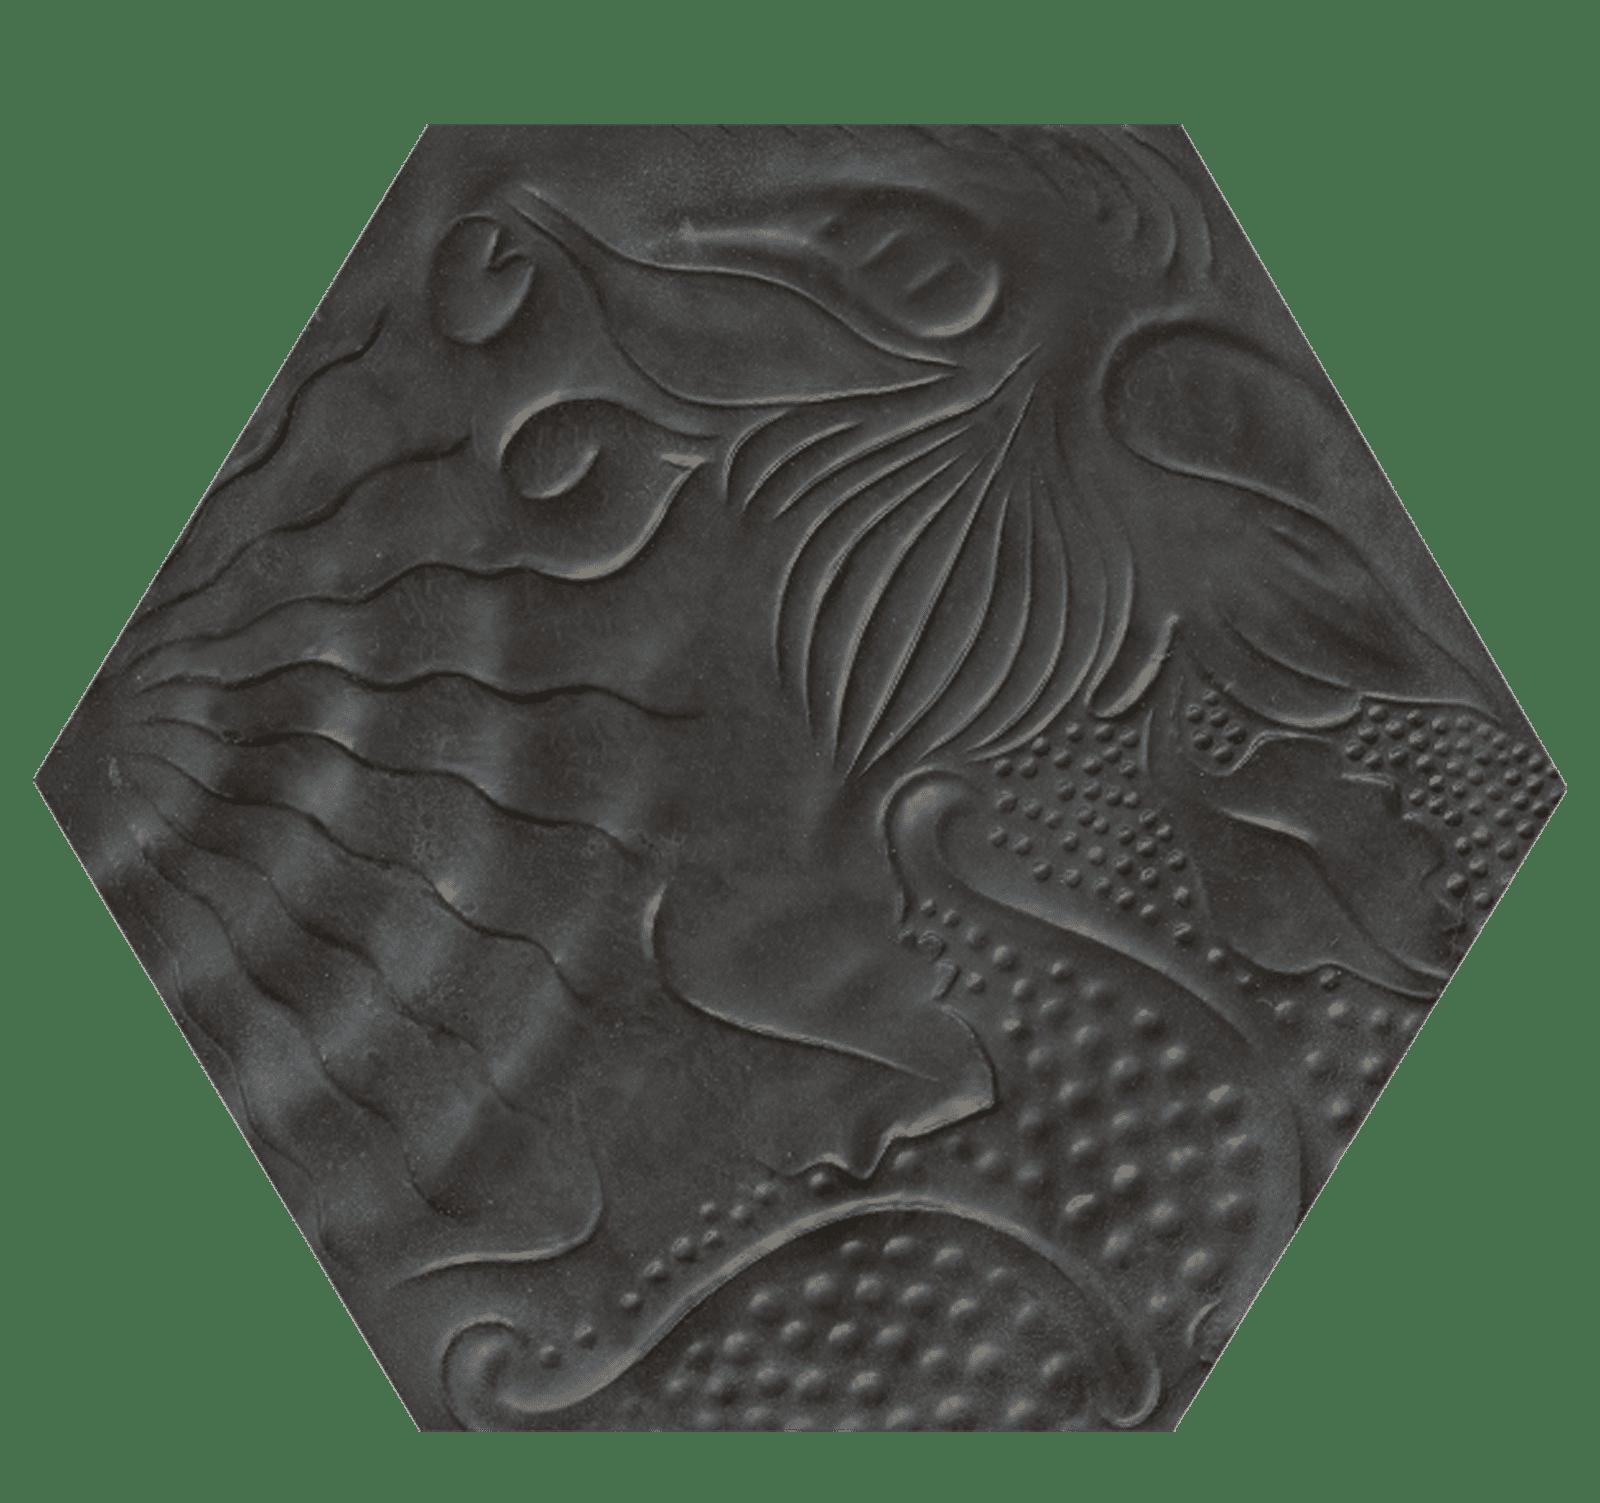 zementfliesen-terrazzofliesen-kreidefarbe-terrazzo-fugenlos-viaplatten-gaudi60 | N° 60G